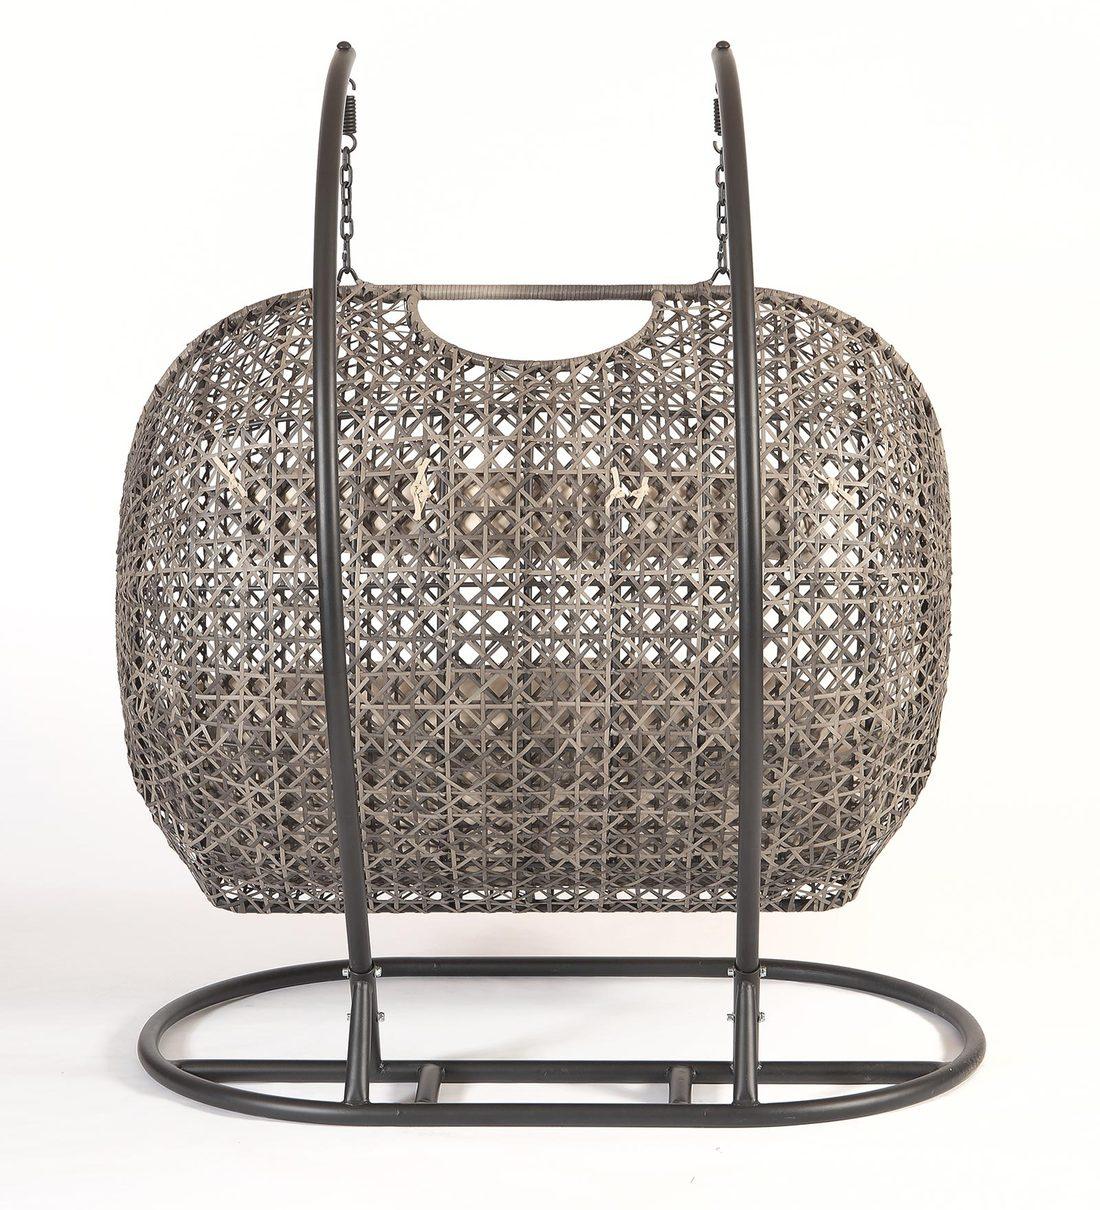 Carry Bird - Luxury Royal Swing 3 Seater